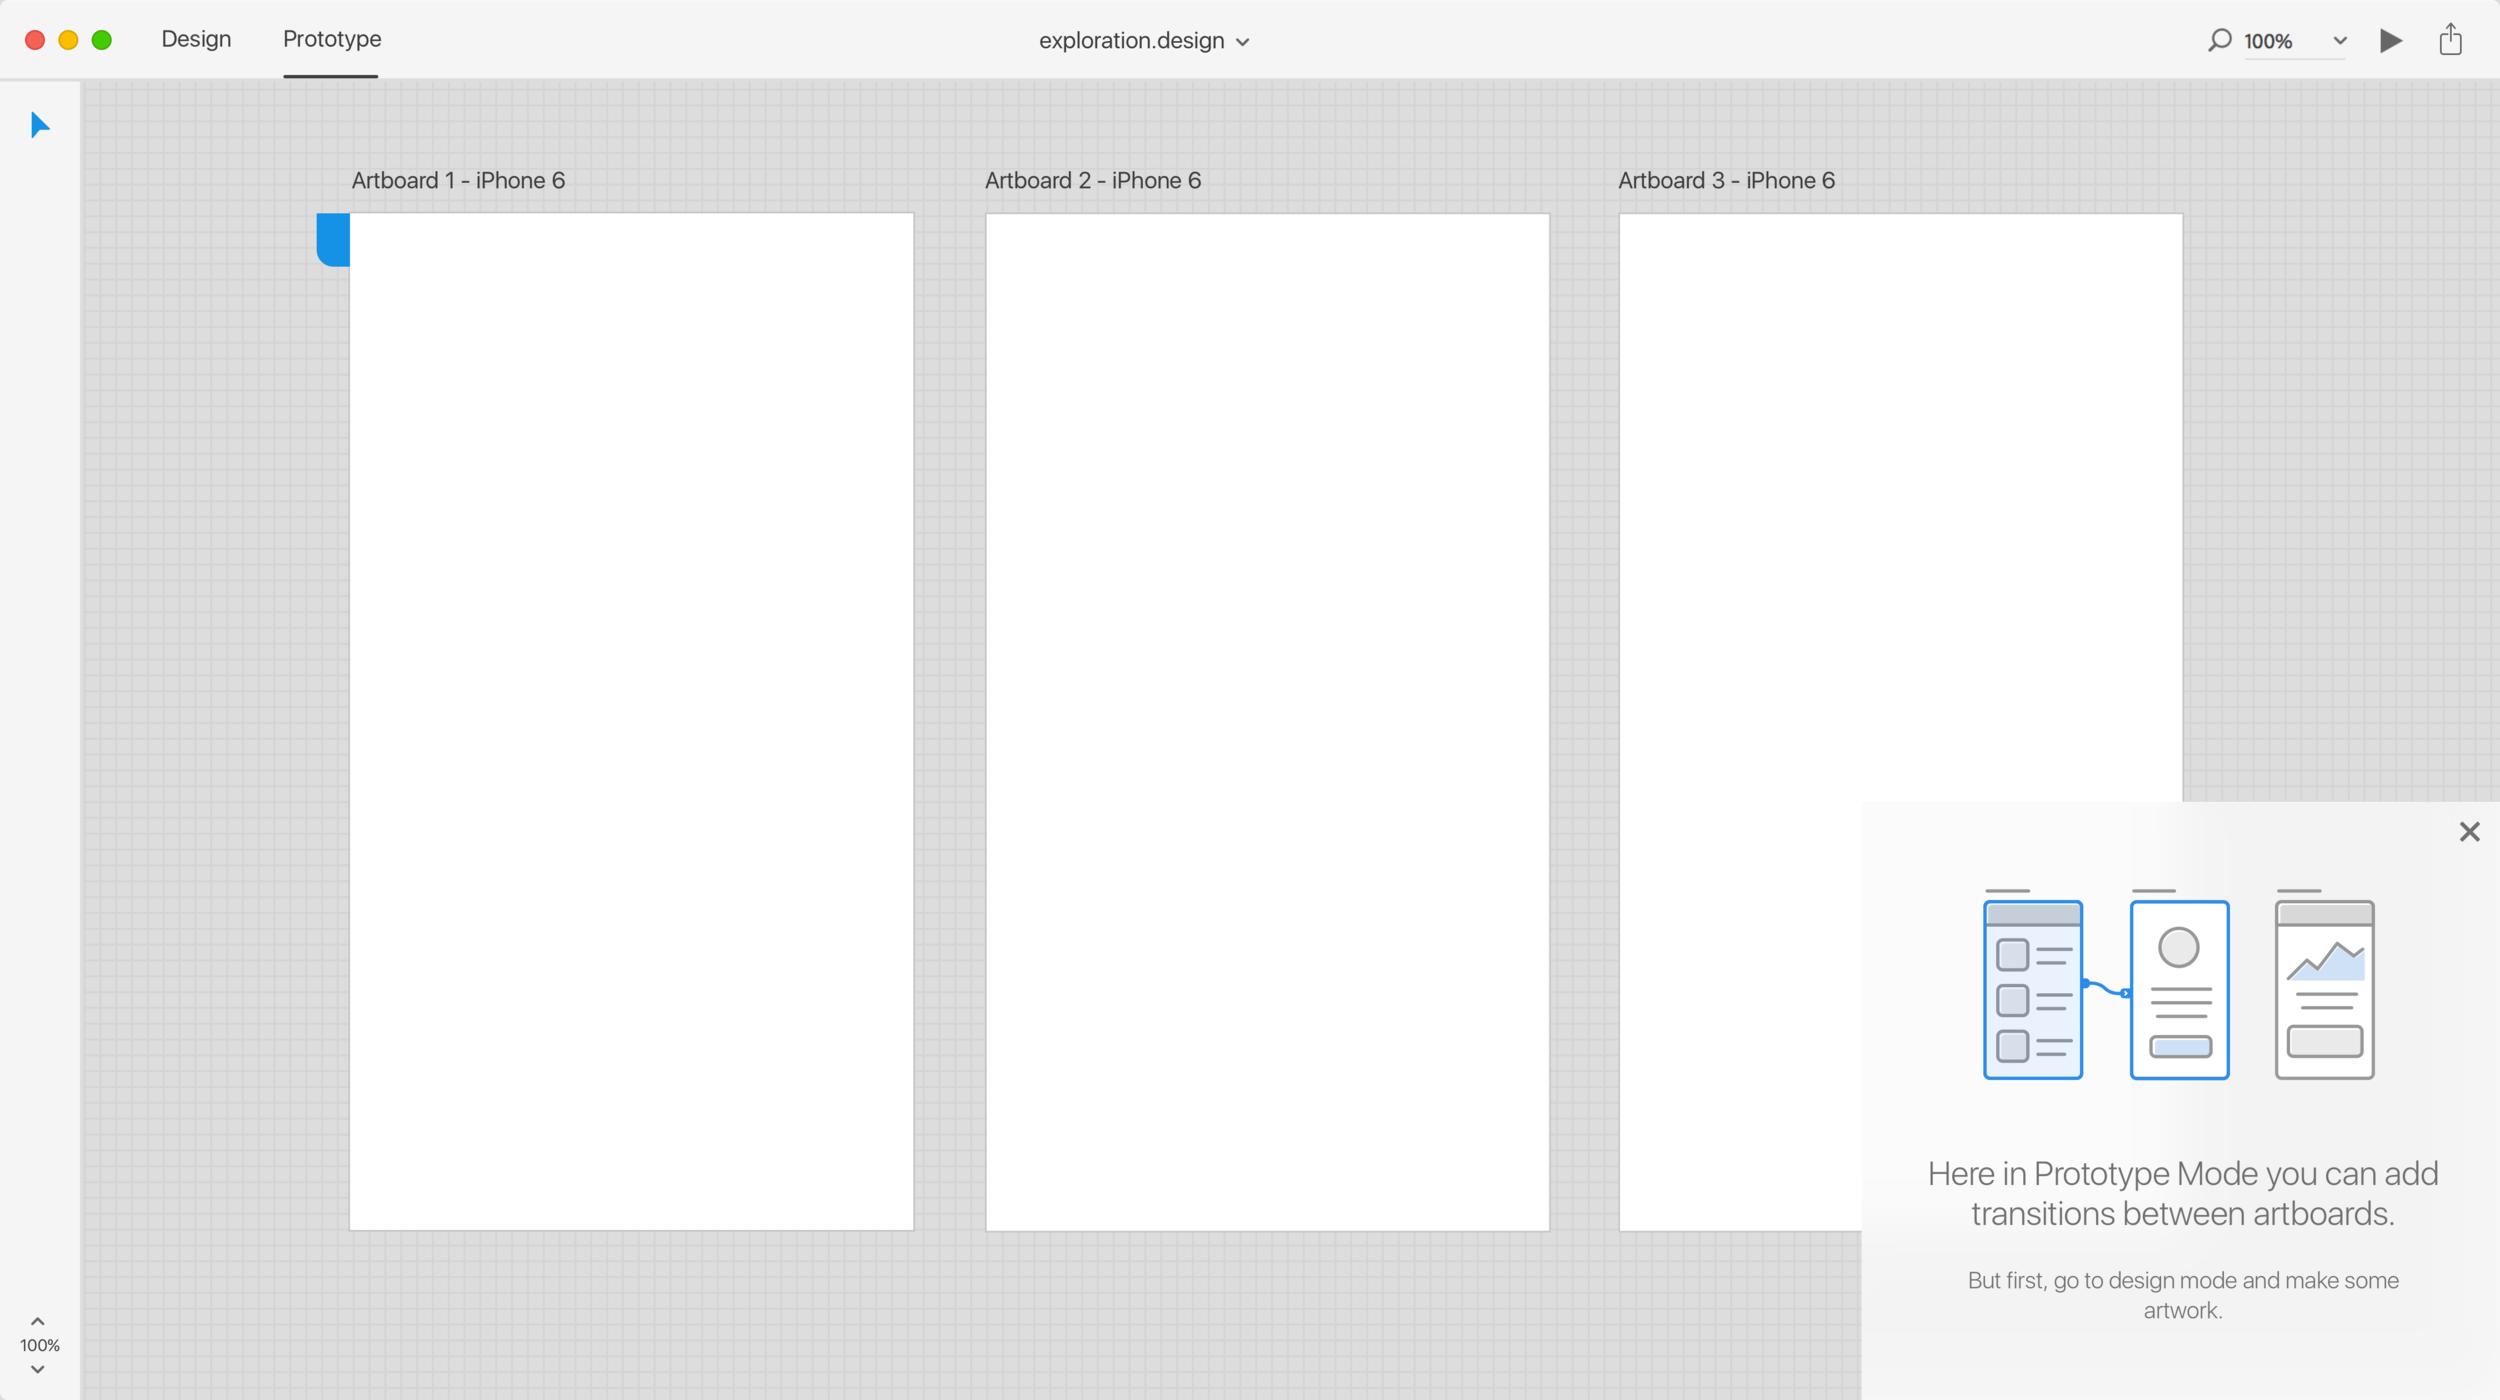 Prototype - empty artboards.png